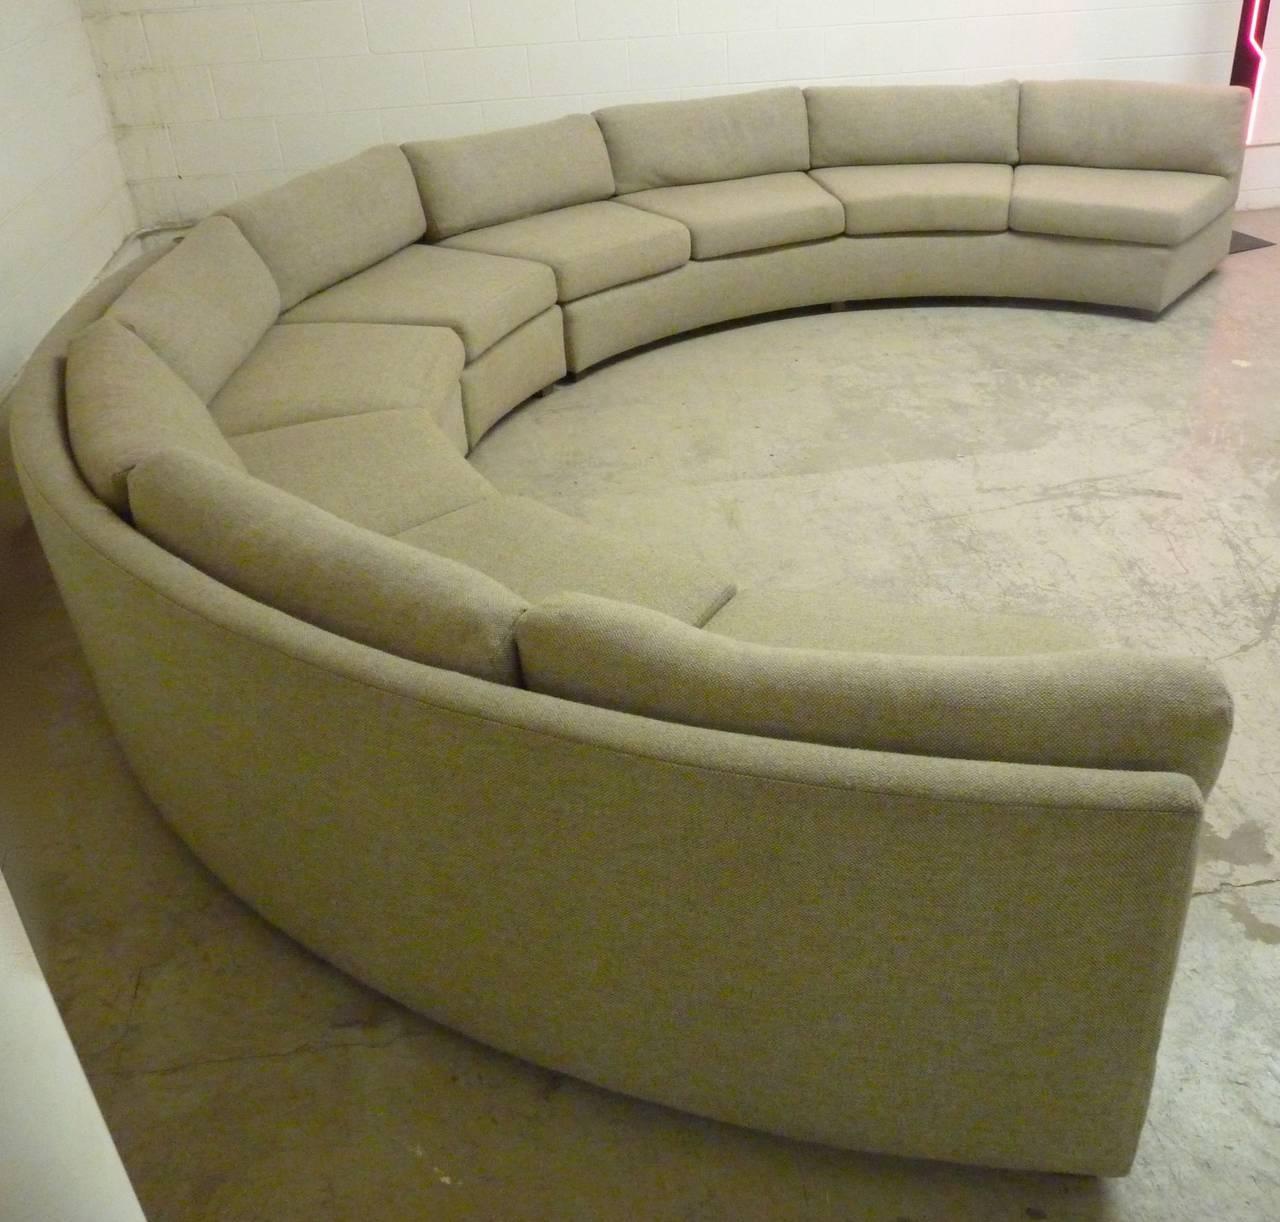 A Very Large, Semi Circular Sectional Sofa, Circa 1970s Consisting Of Two  Equally